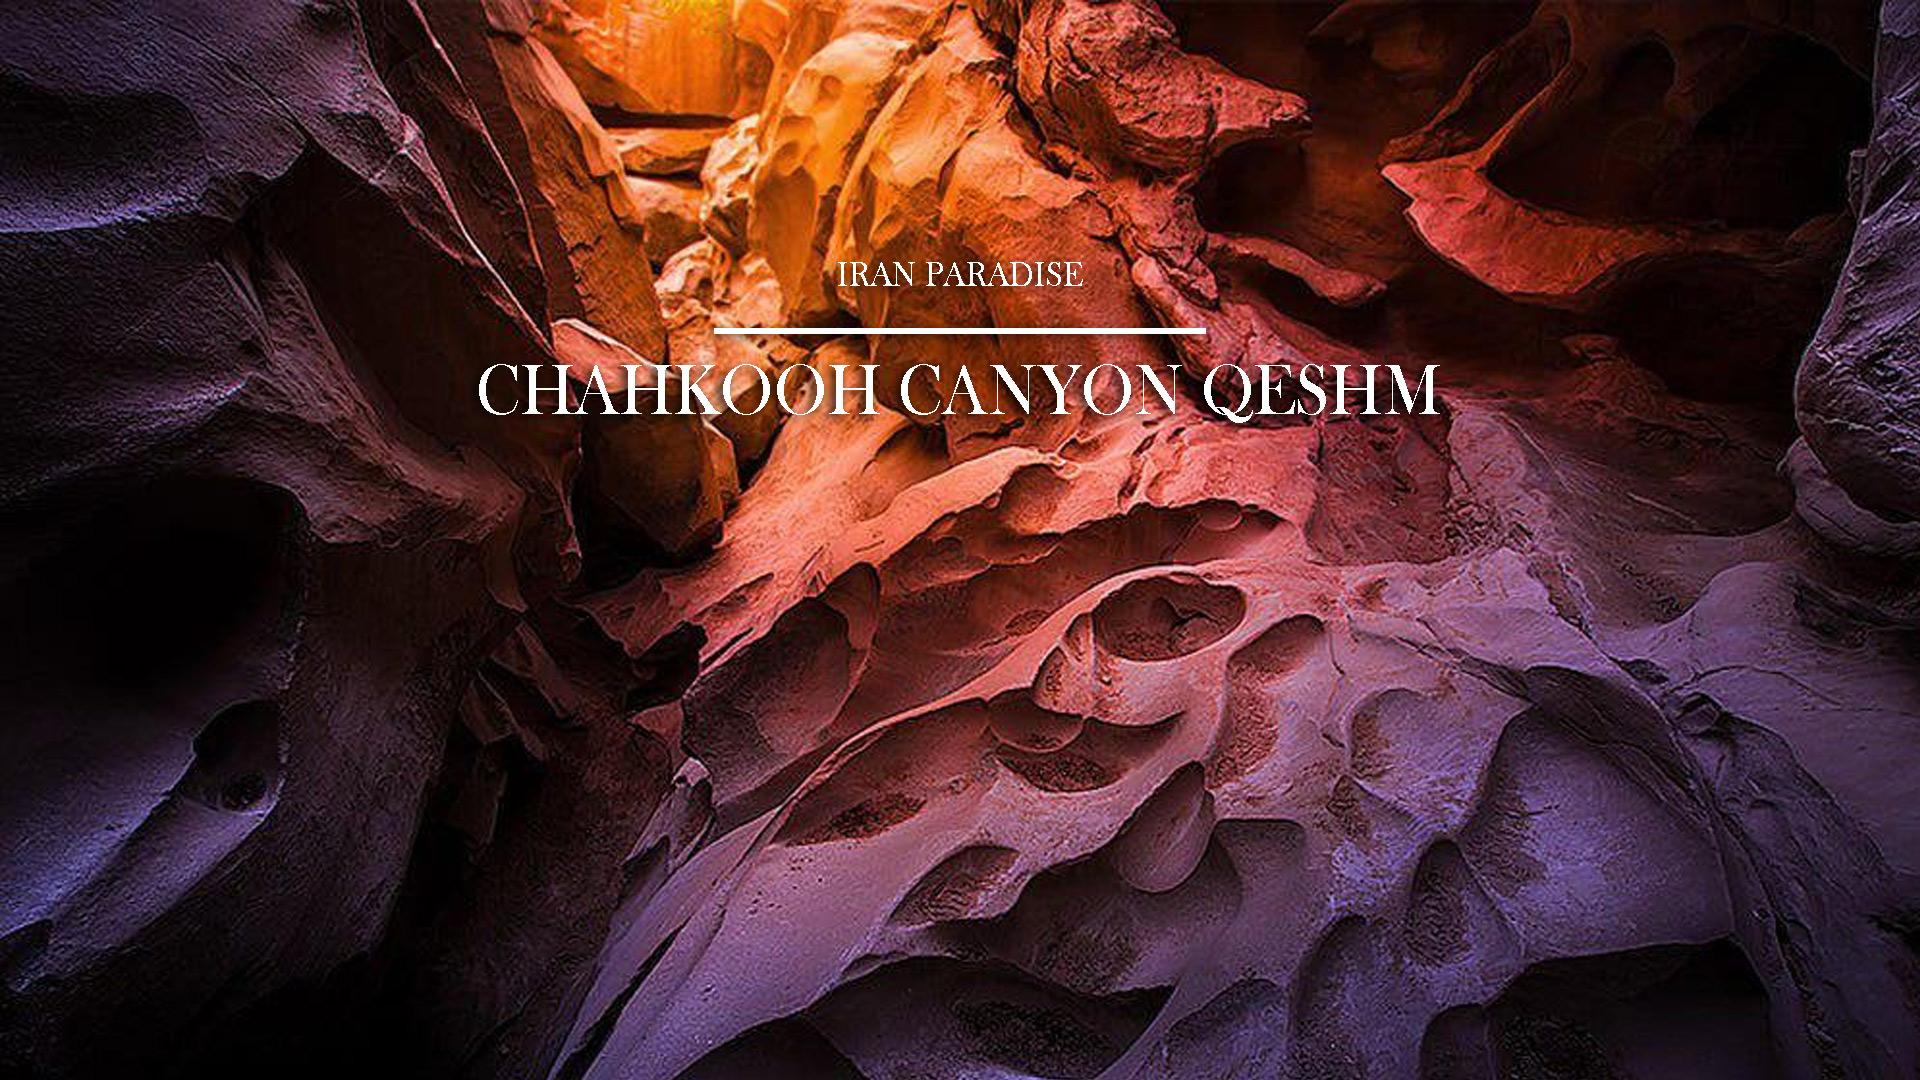 Chahkooh Canyon Qeshm